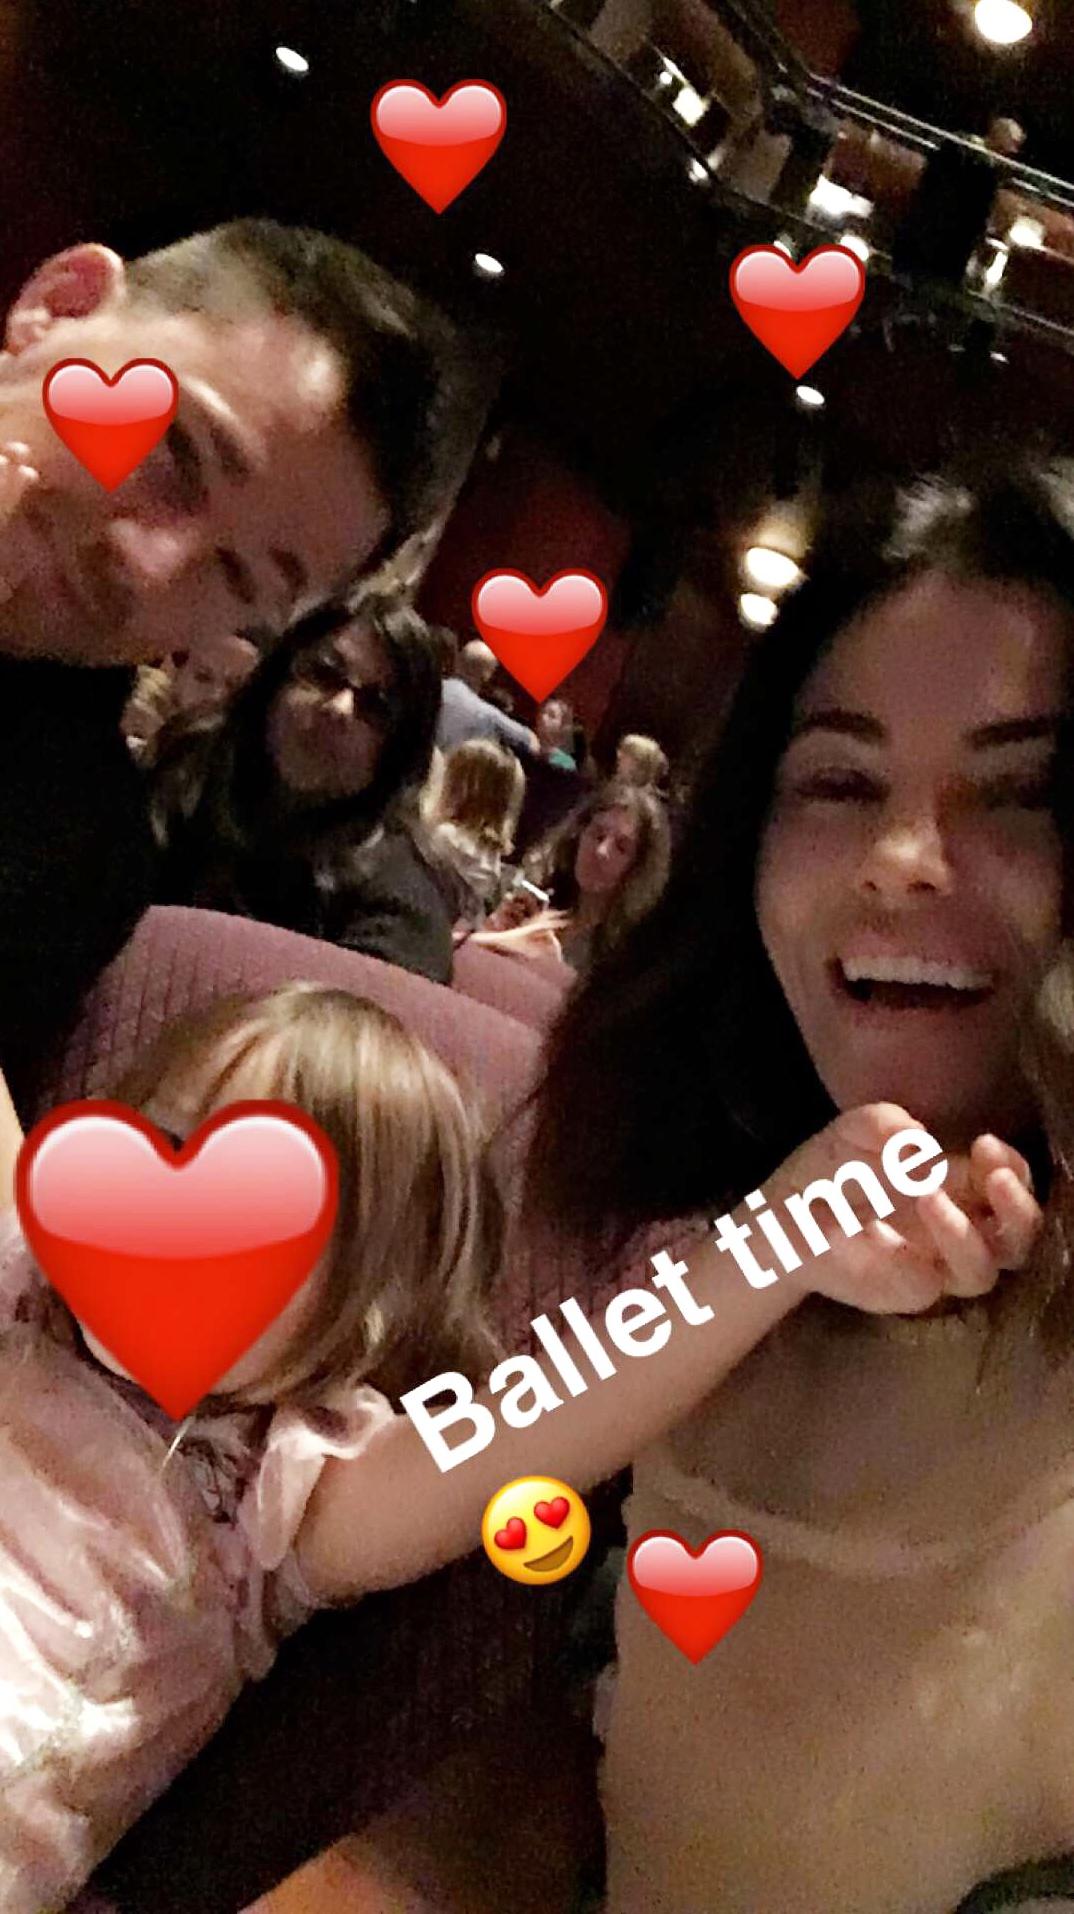 Channing Tatum Jenna Dewan Everly Snapchat nutcracker